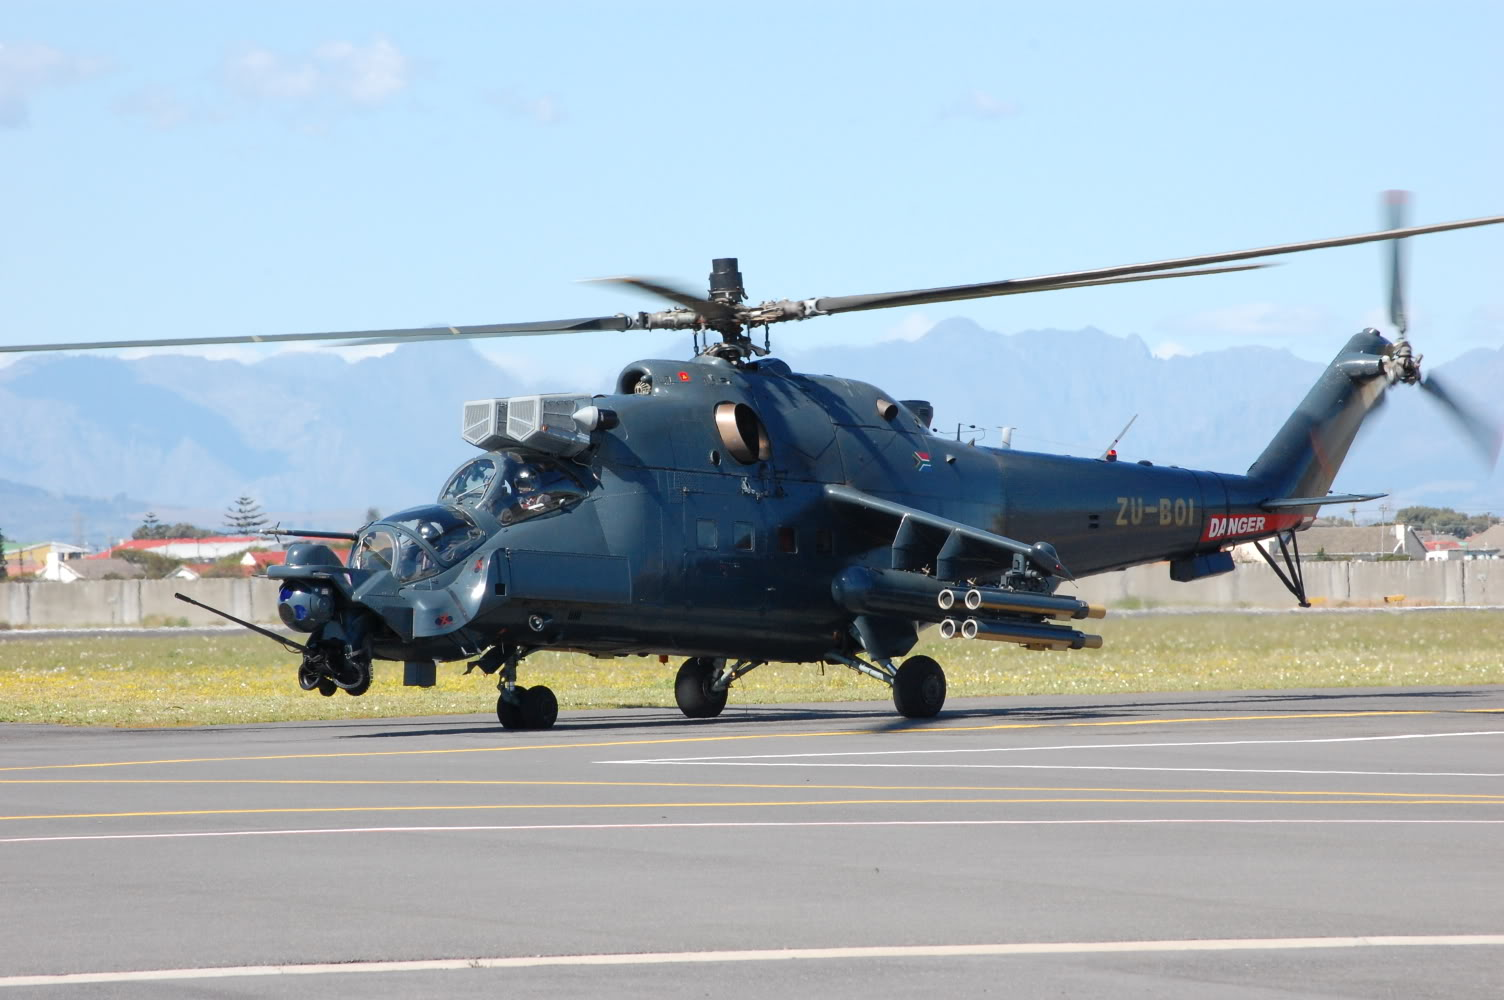 ATE_Mi-24_Super_Hind_Mk_III_02